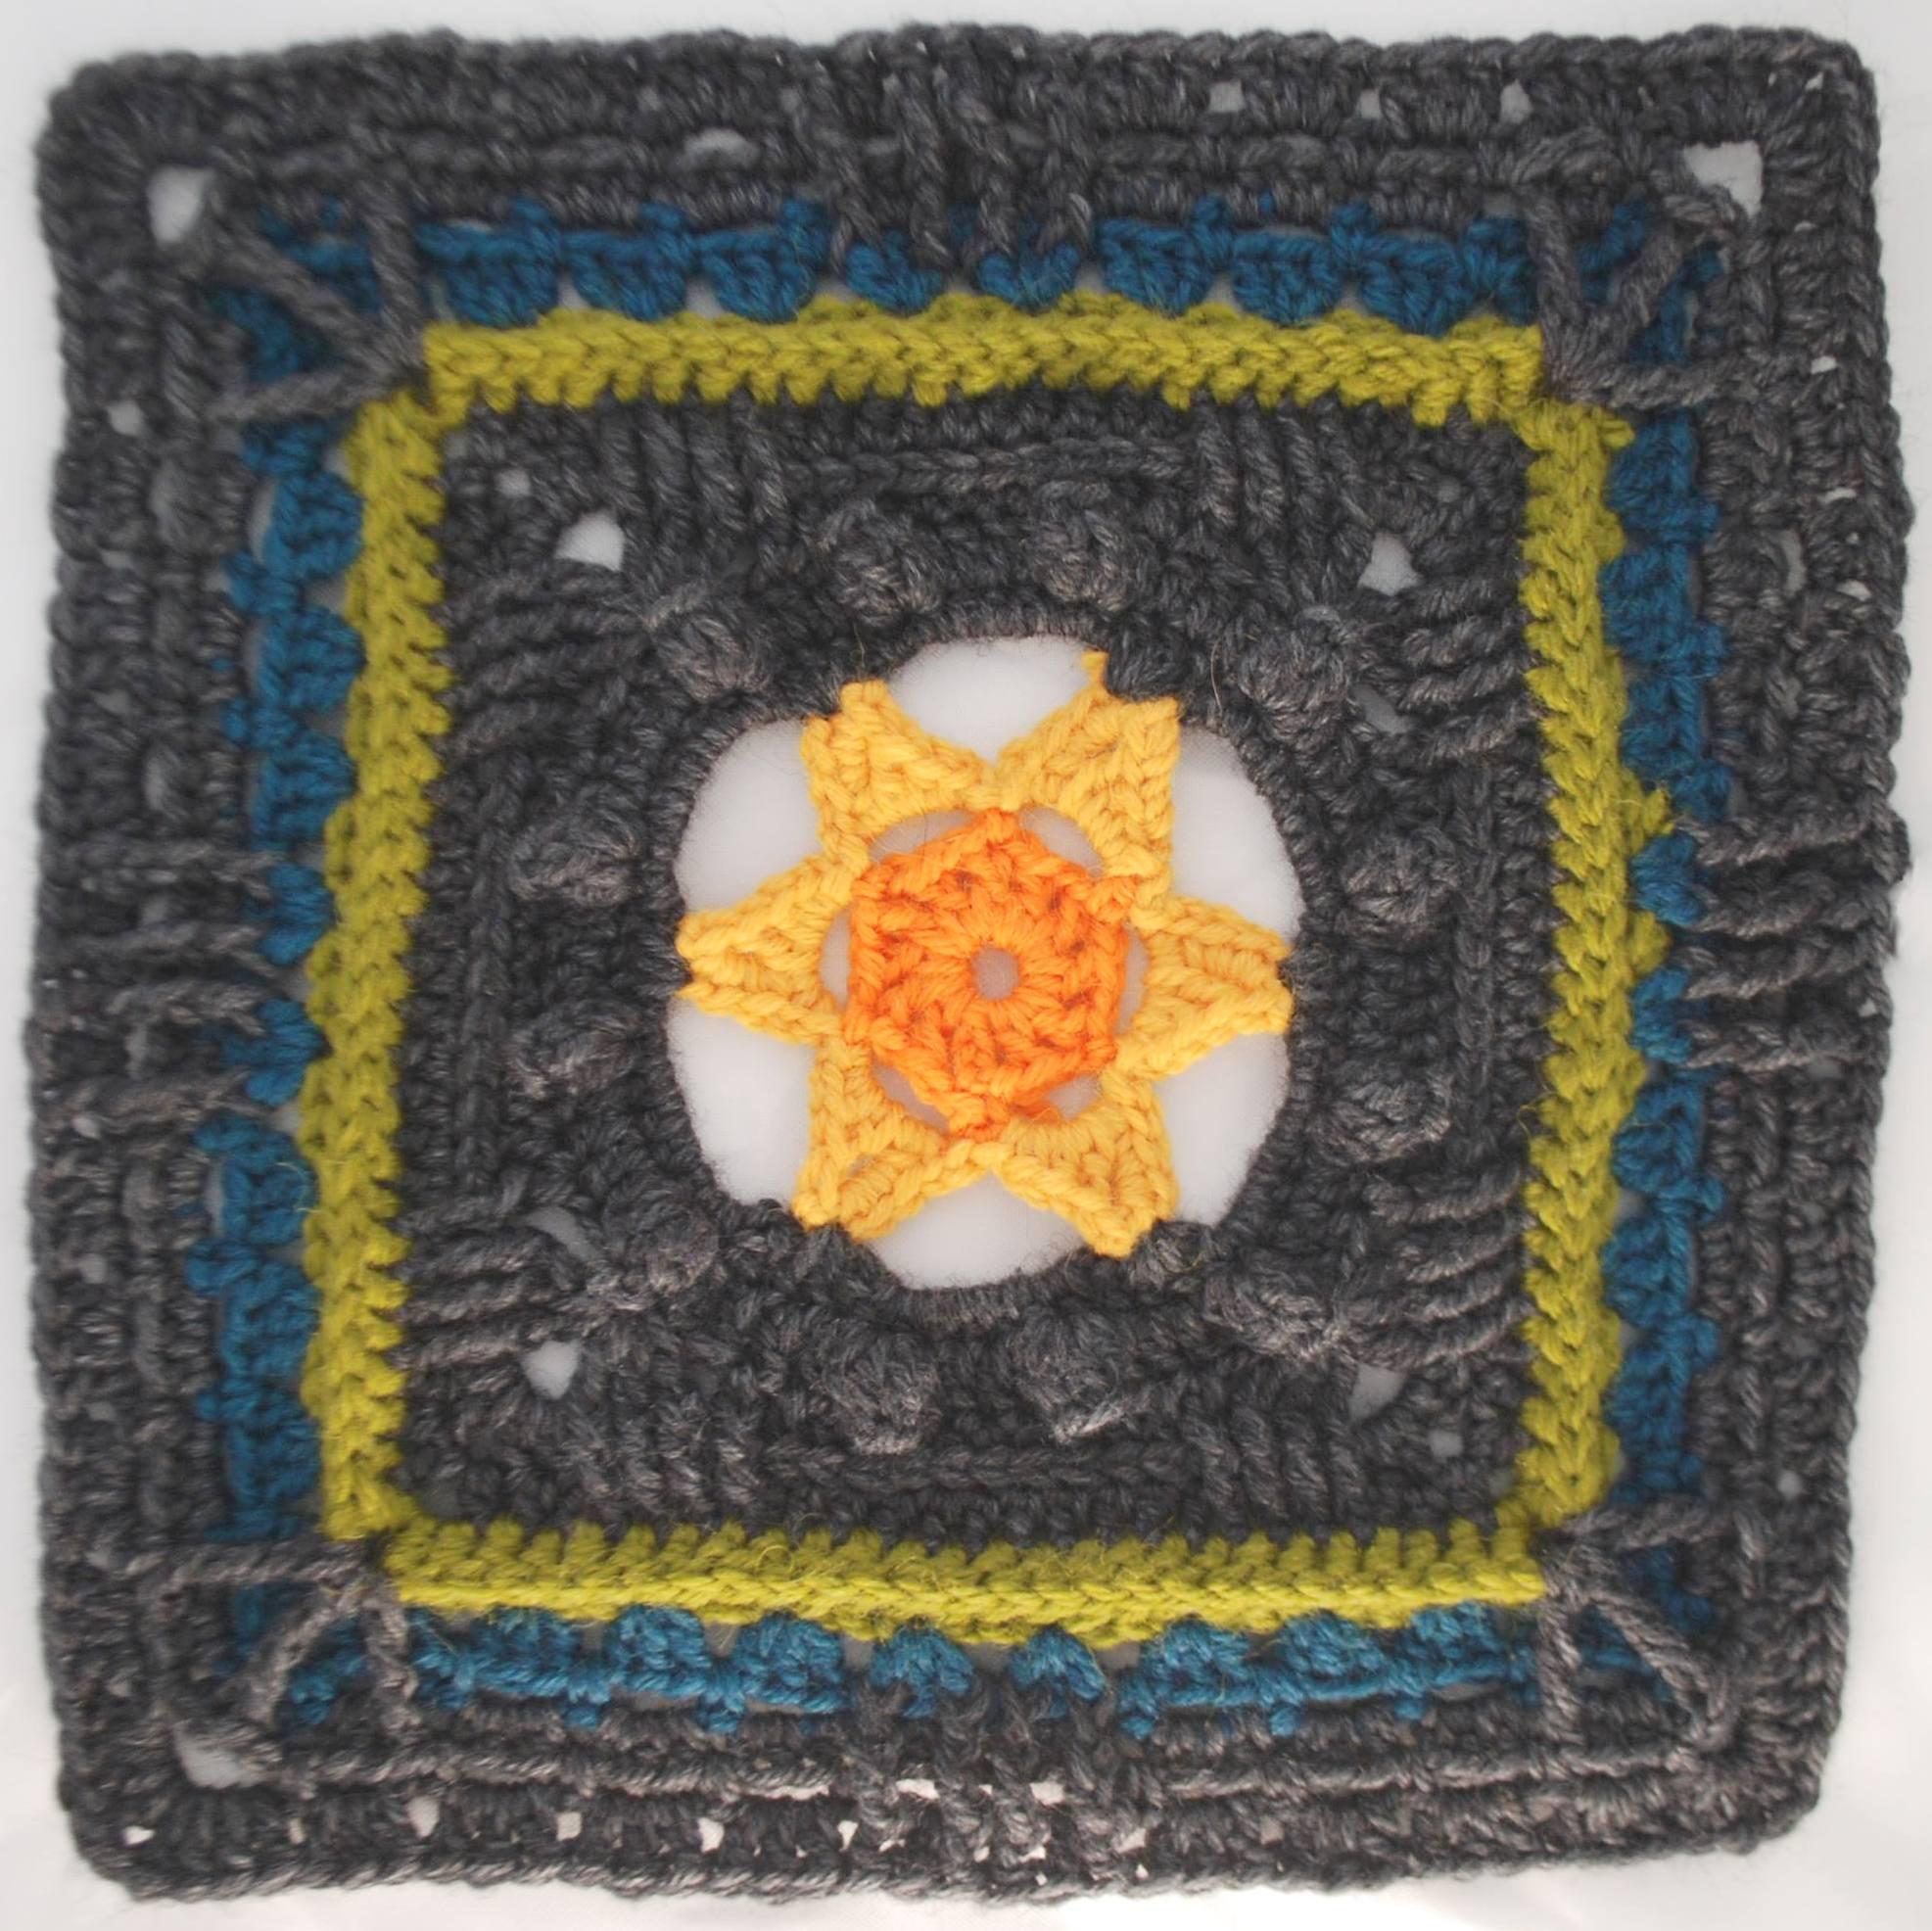 Kalevala CAL - Osa 4 - Kätketty aurinko | Crochet and knit designs and patterns | Sari Åström ...